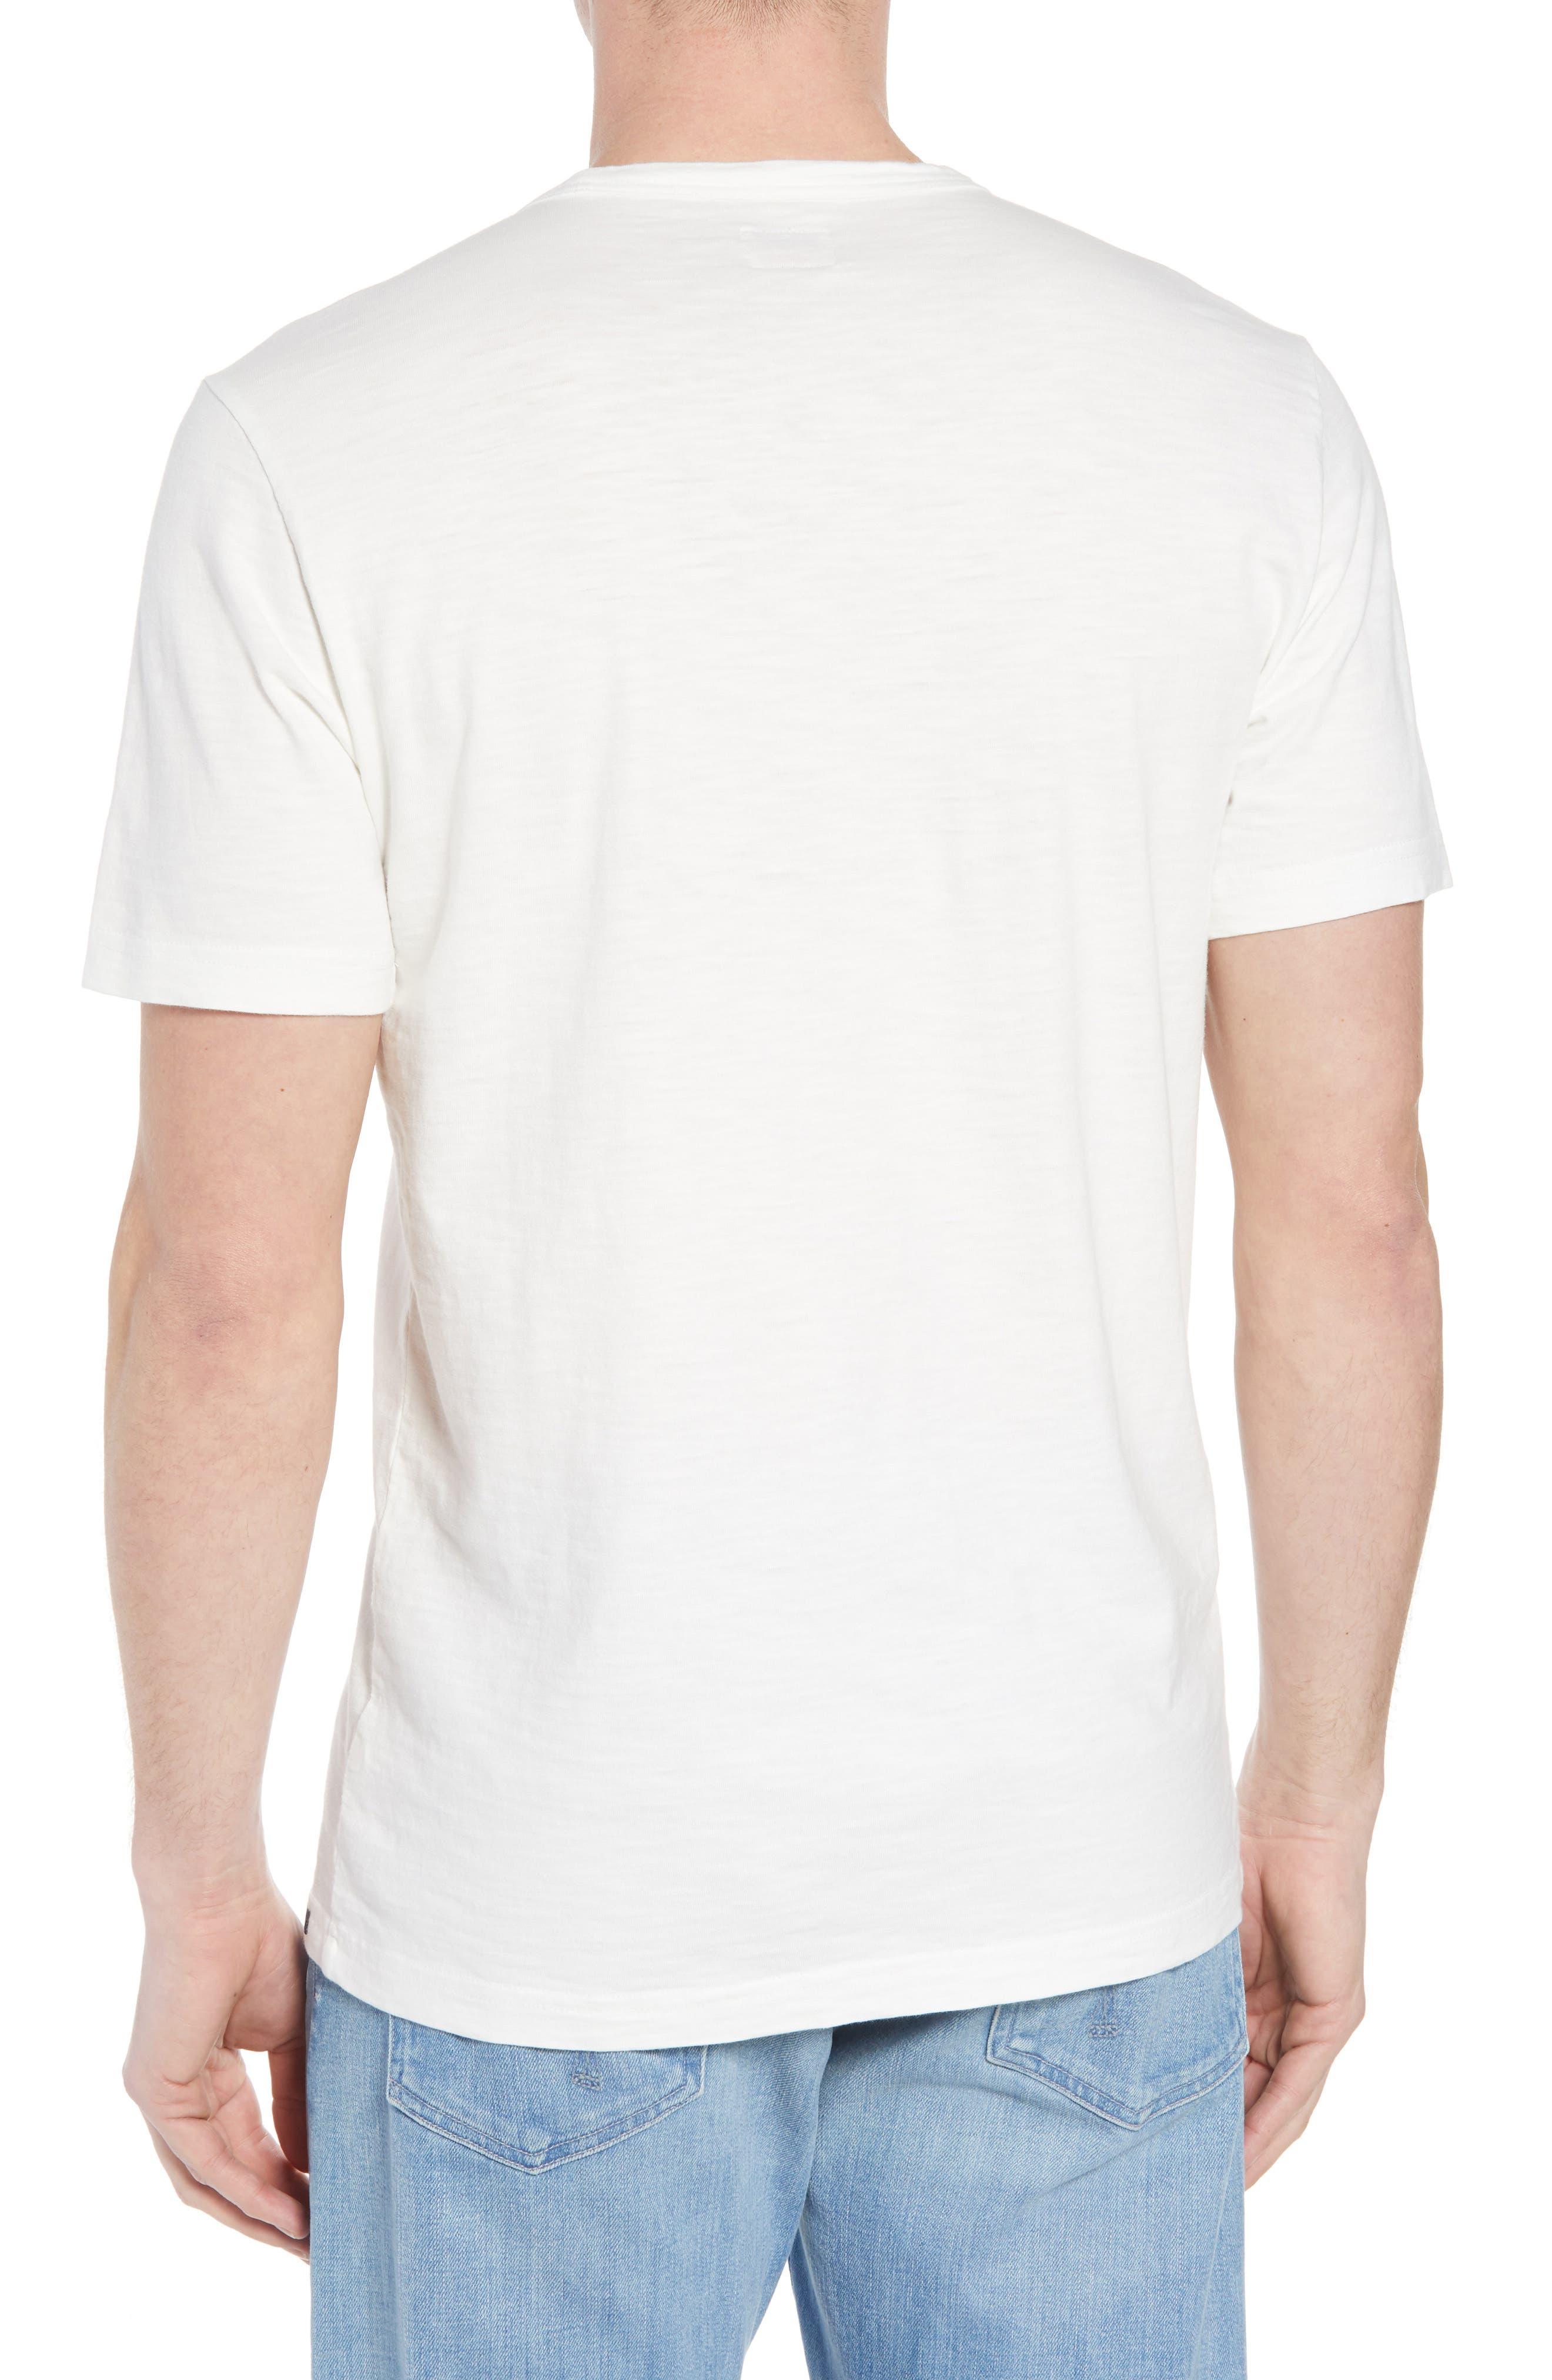 Surf Stripe Pocket T-Shirt,                             Alternate thumbnail 2, color,                             WHITE SURF STRIPE